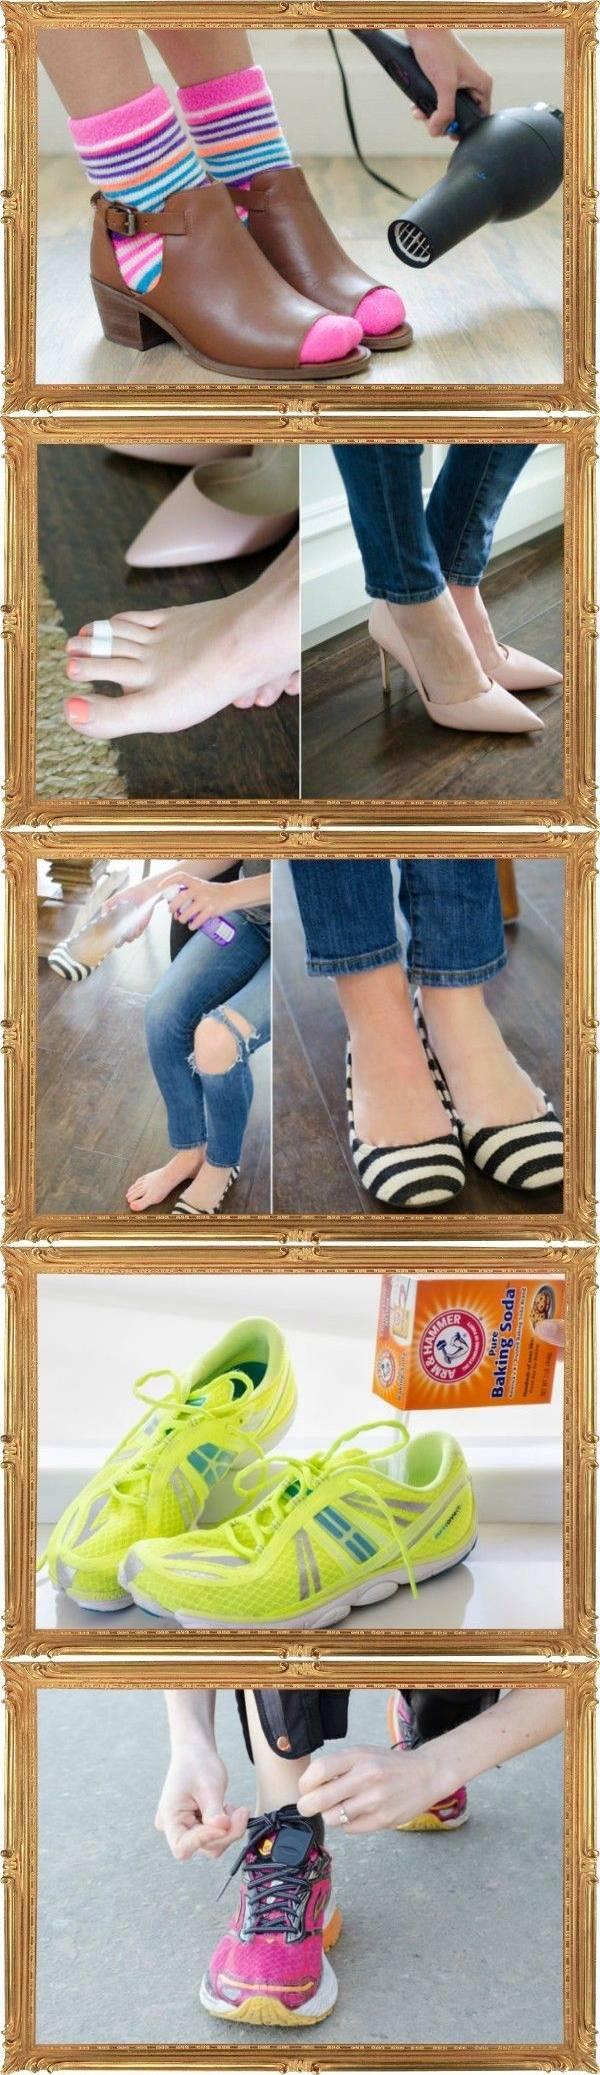 Уход за обувью — 15 лайфхаков